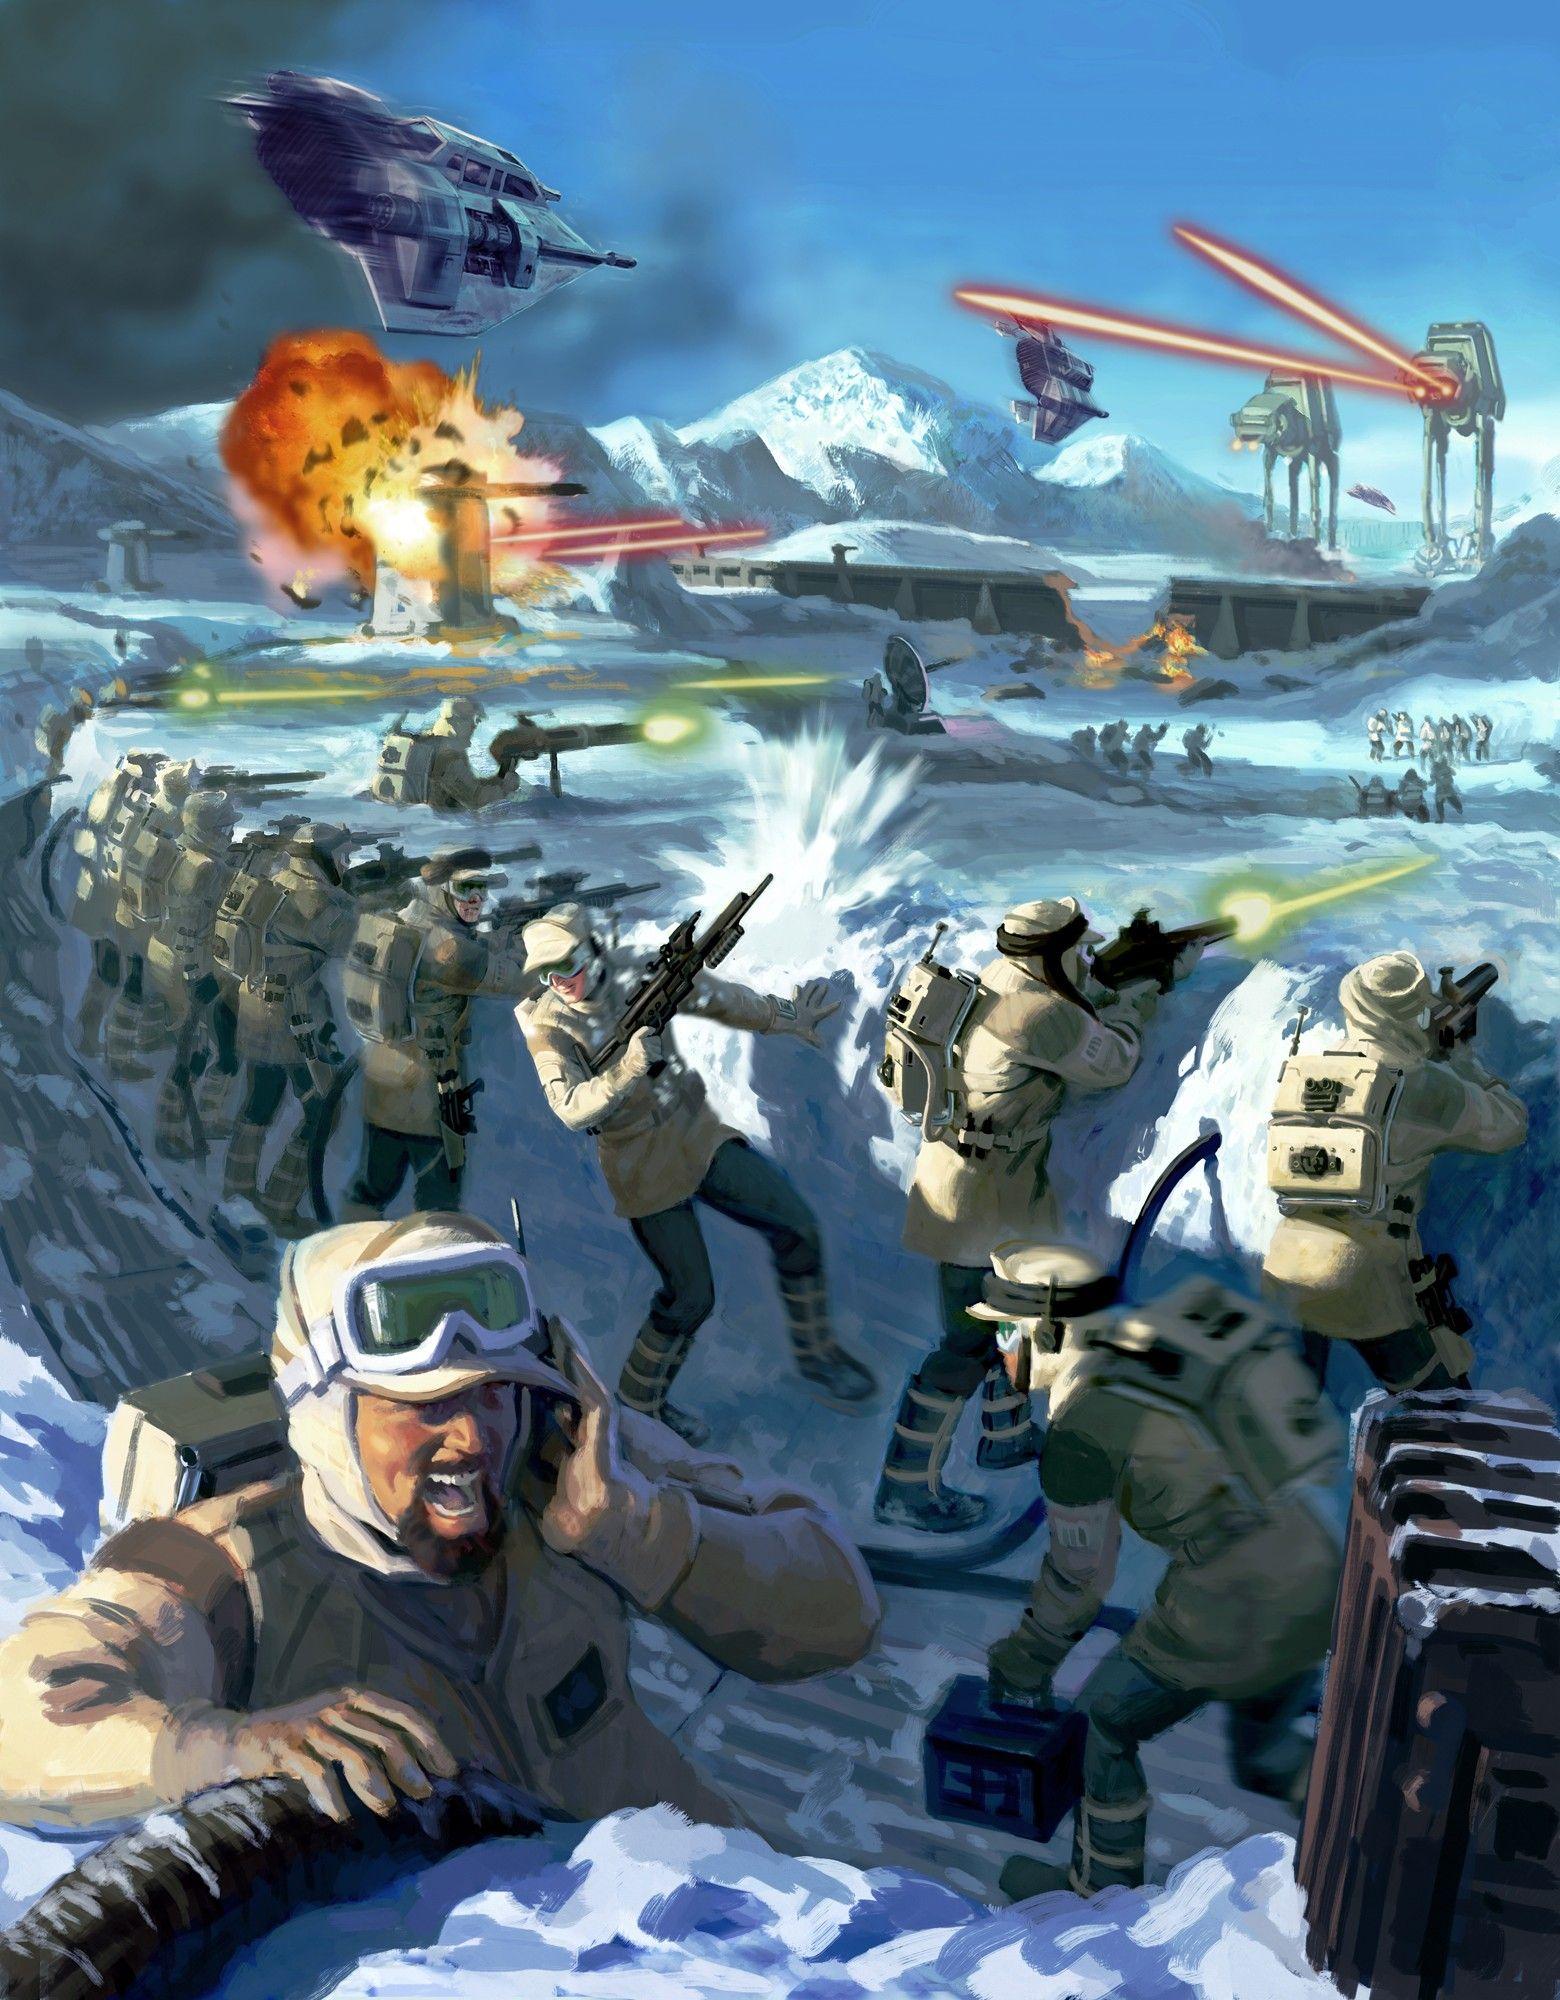 Battle Of Hoth Star Wars Art Star Wars Wallpaper Star Wars Pictures